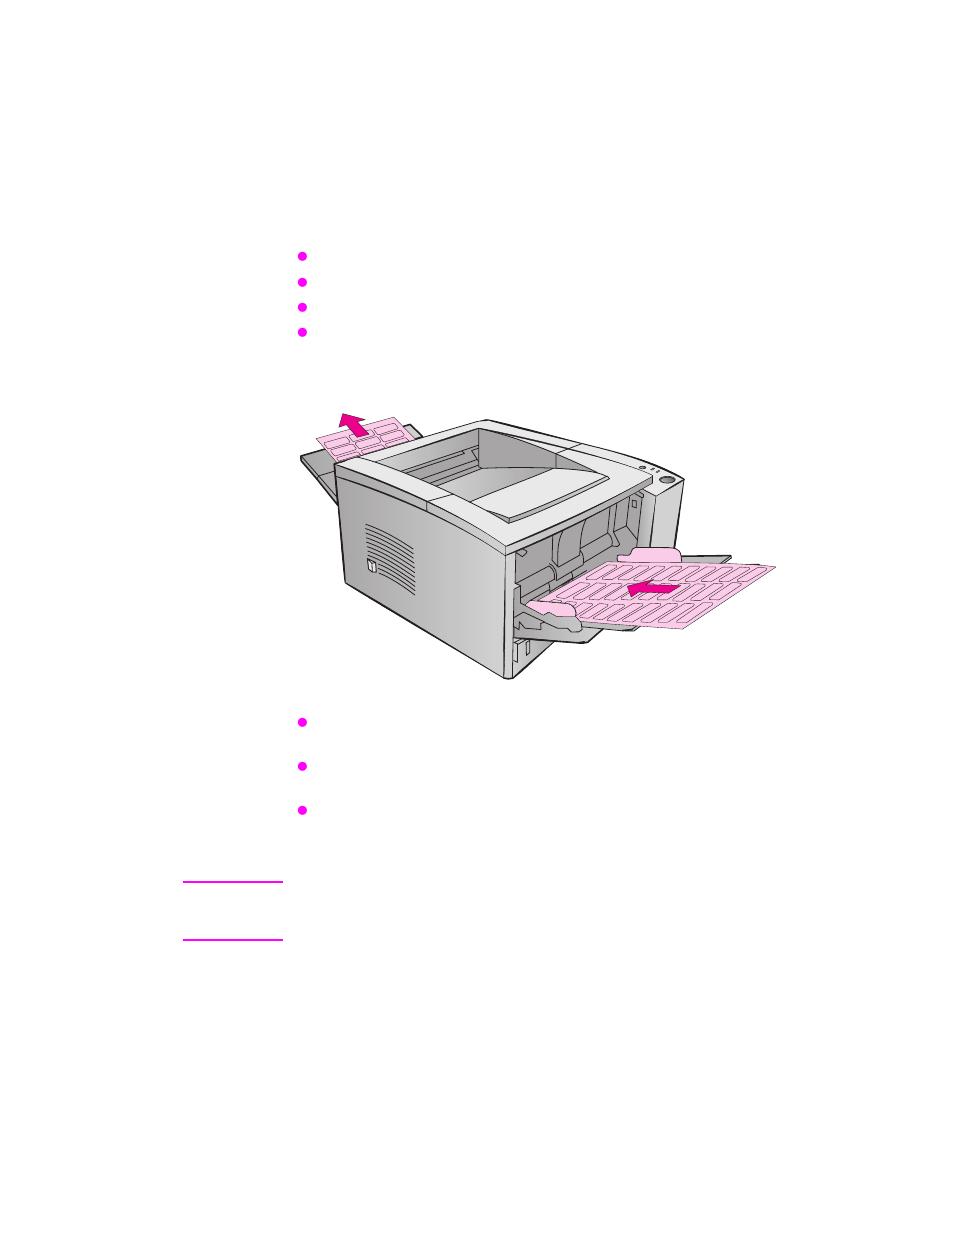 printing on labels software tasks hp 2100 tn user manual page rh manualsdir com hp48 manual pdf hp 49 g manual